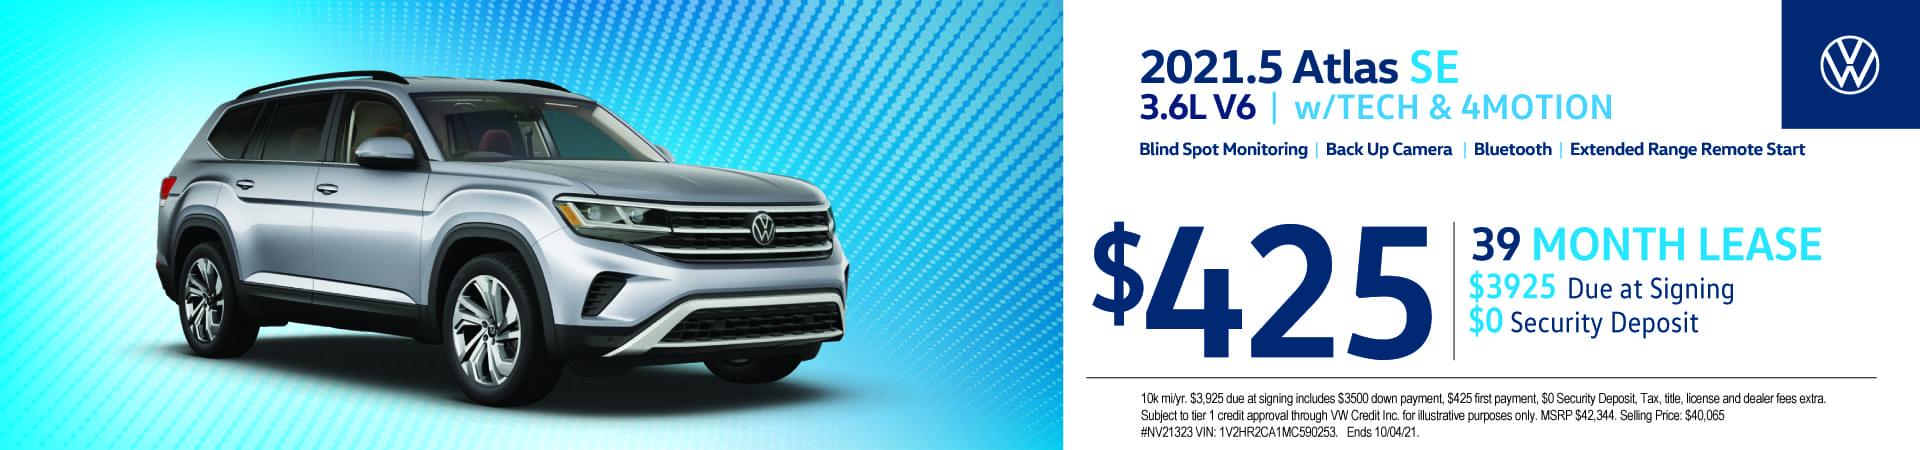 Sep-2021-VW-CS-Slides_2021.5-Atlas